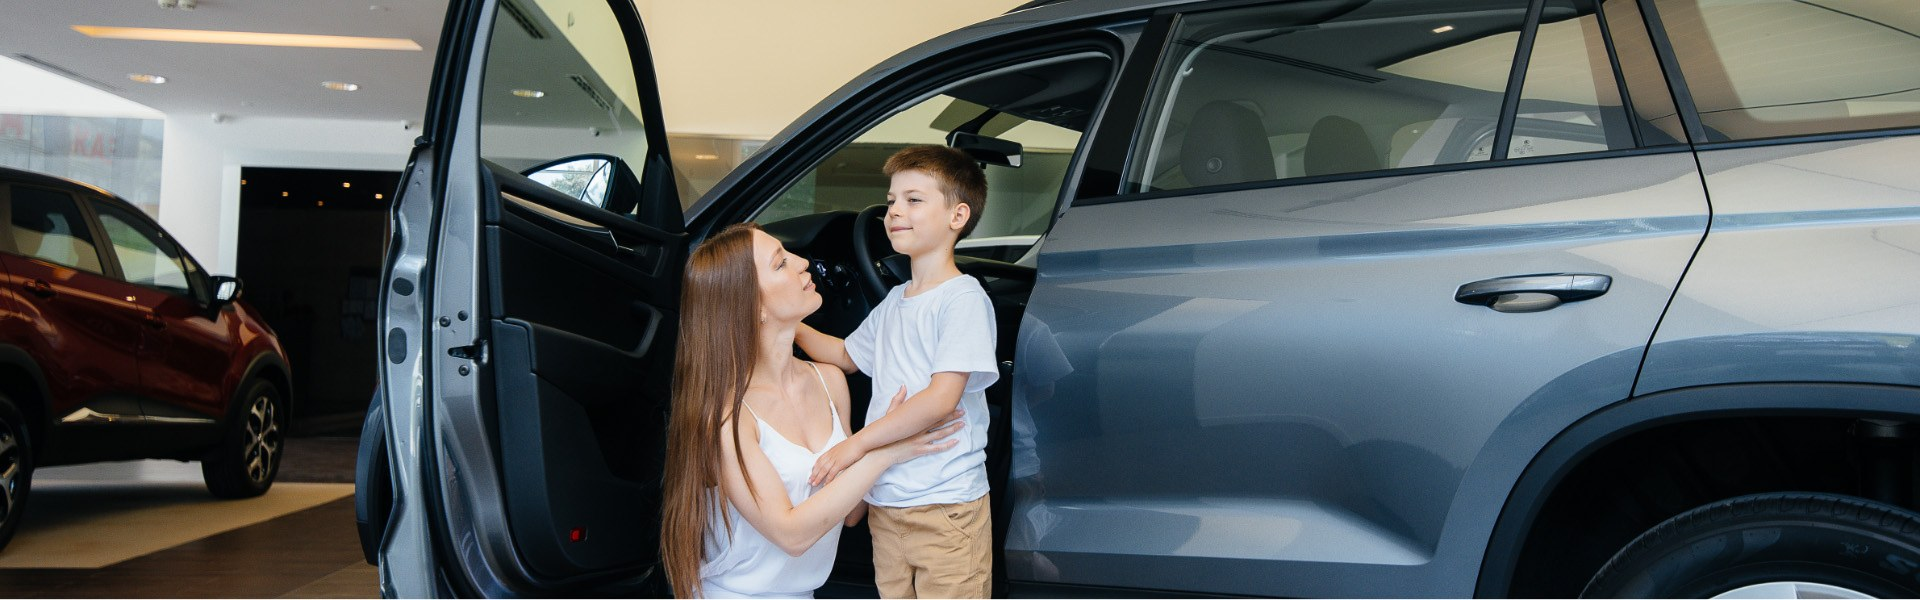 Adult and child standing beside a grey minivan with its door open